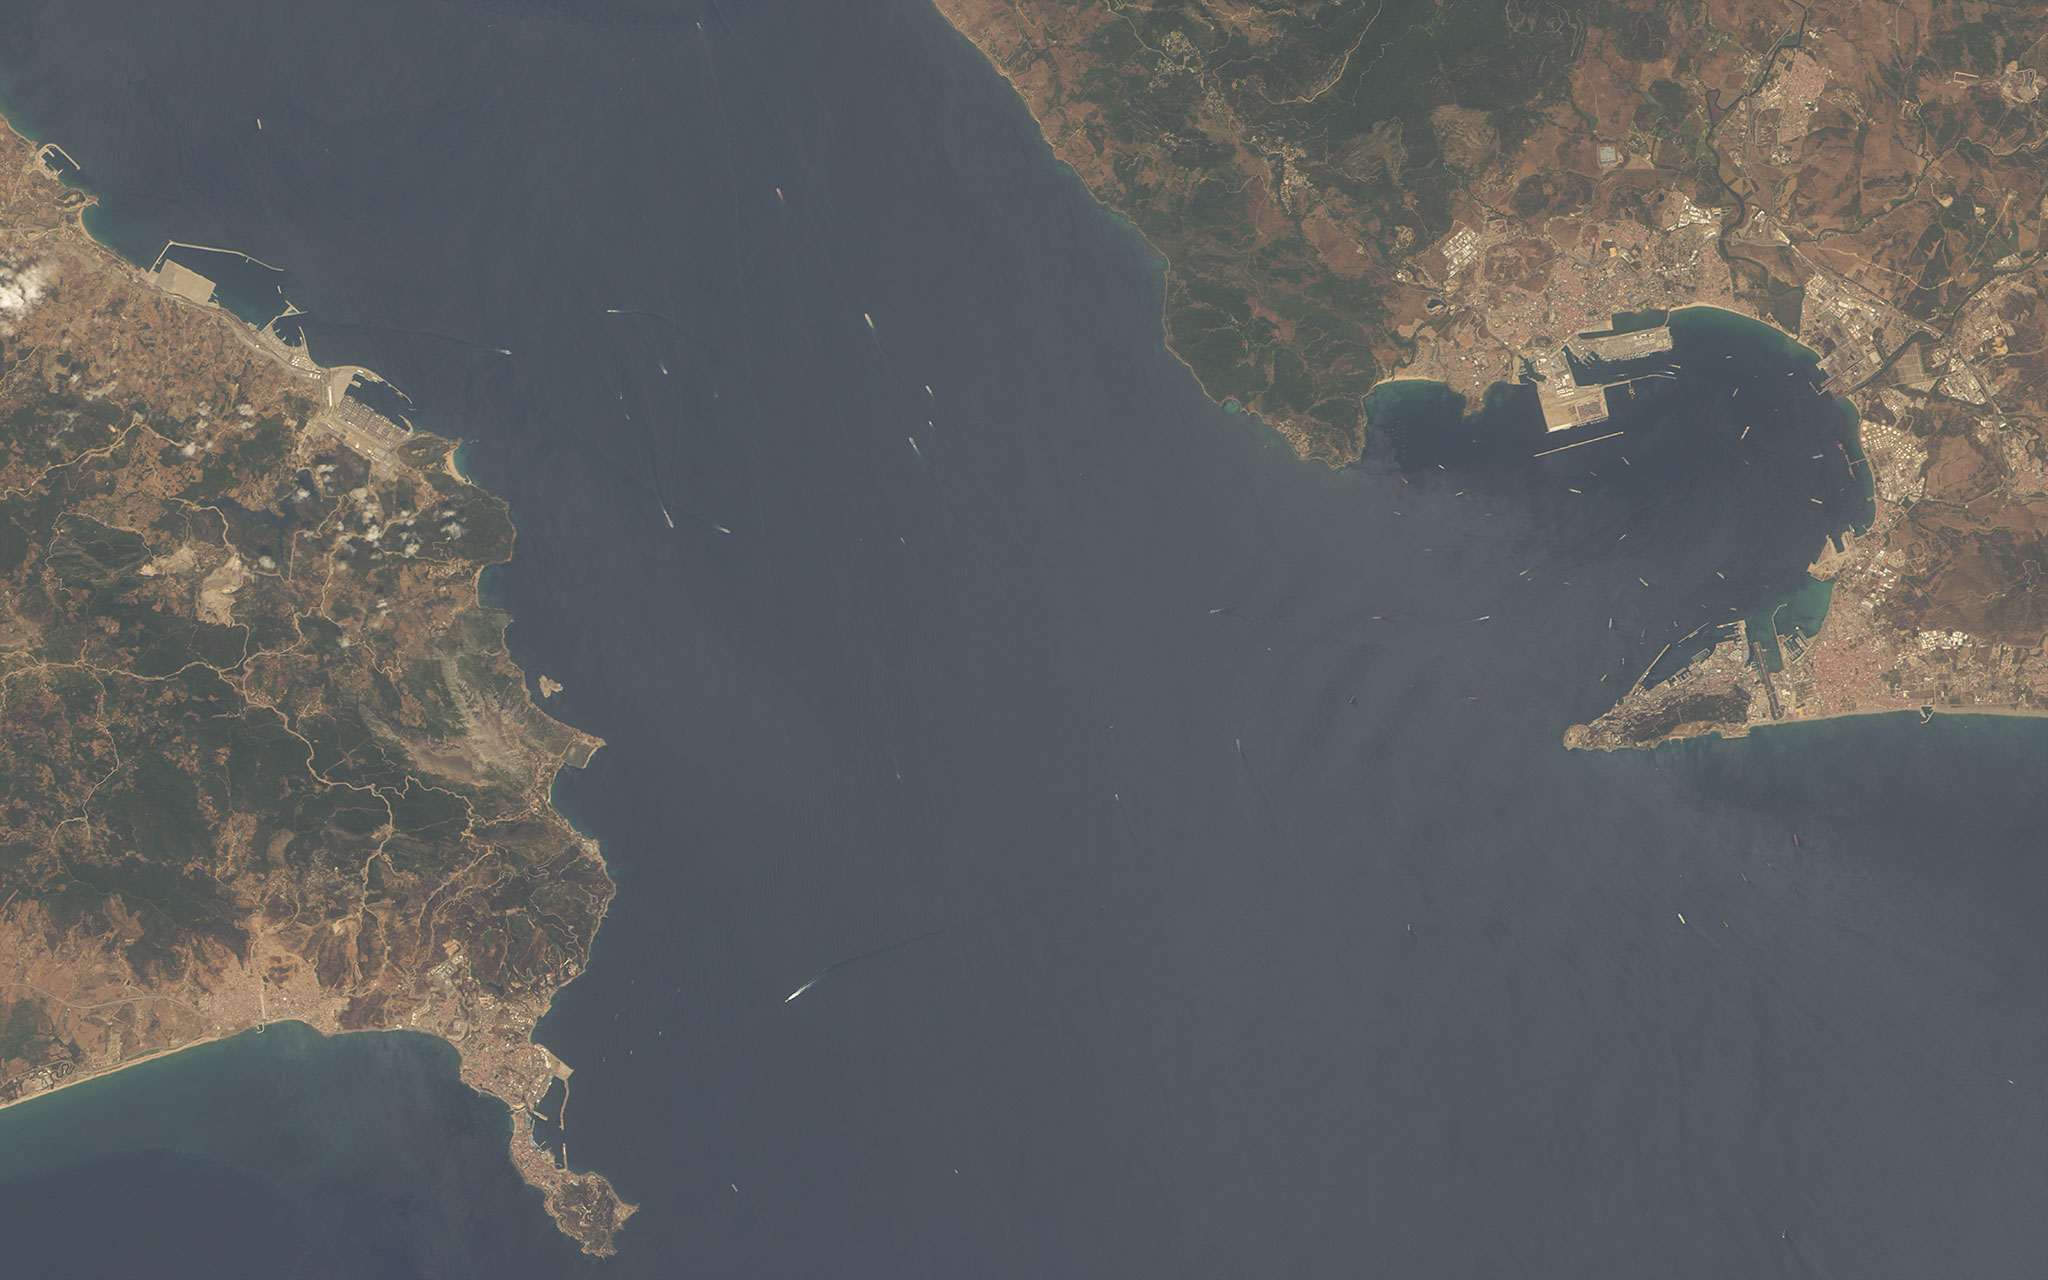 FileStrait Of Gibraltar Satellite Viewjpg Wikimedia Commons - Earth satellite view 2016